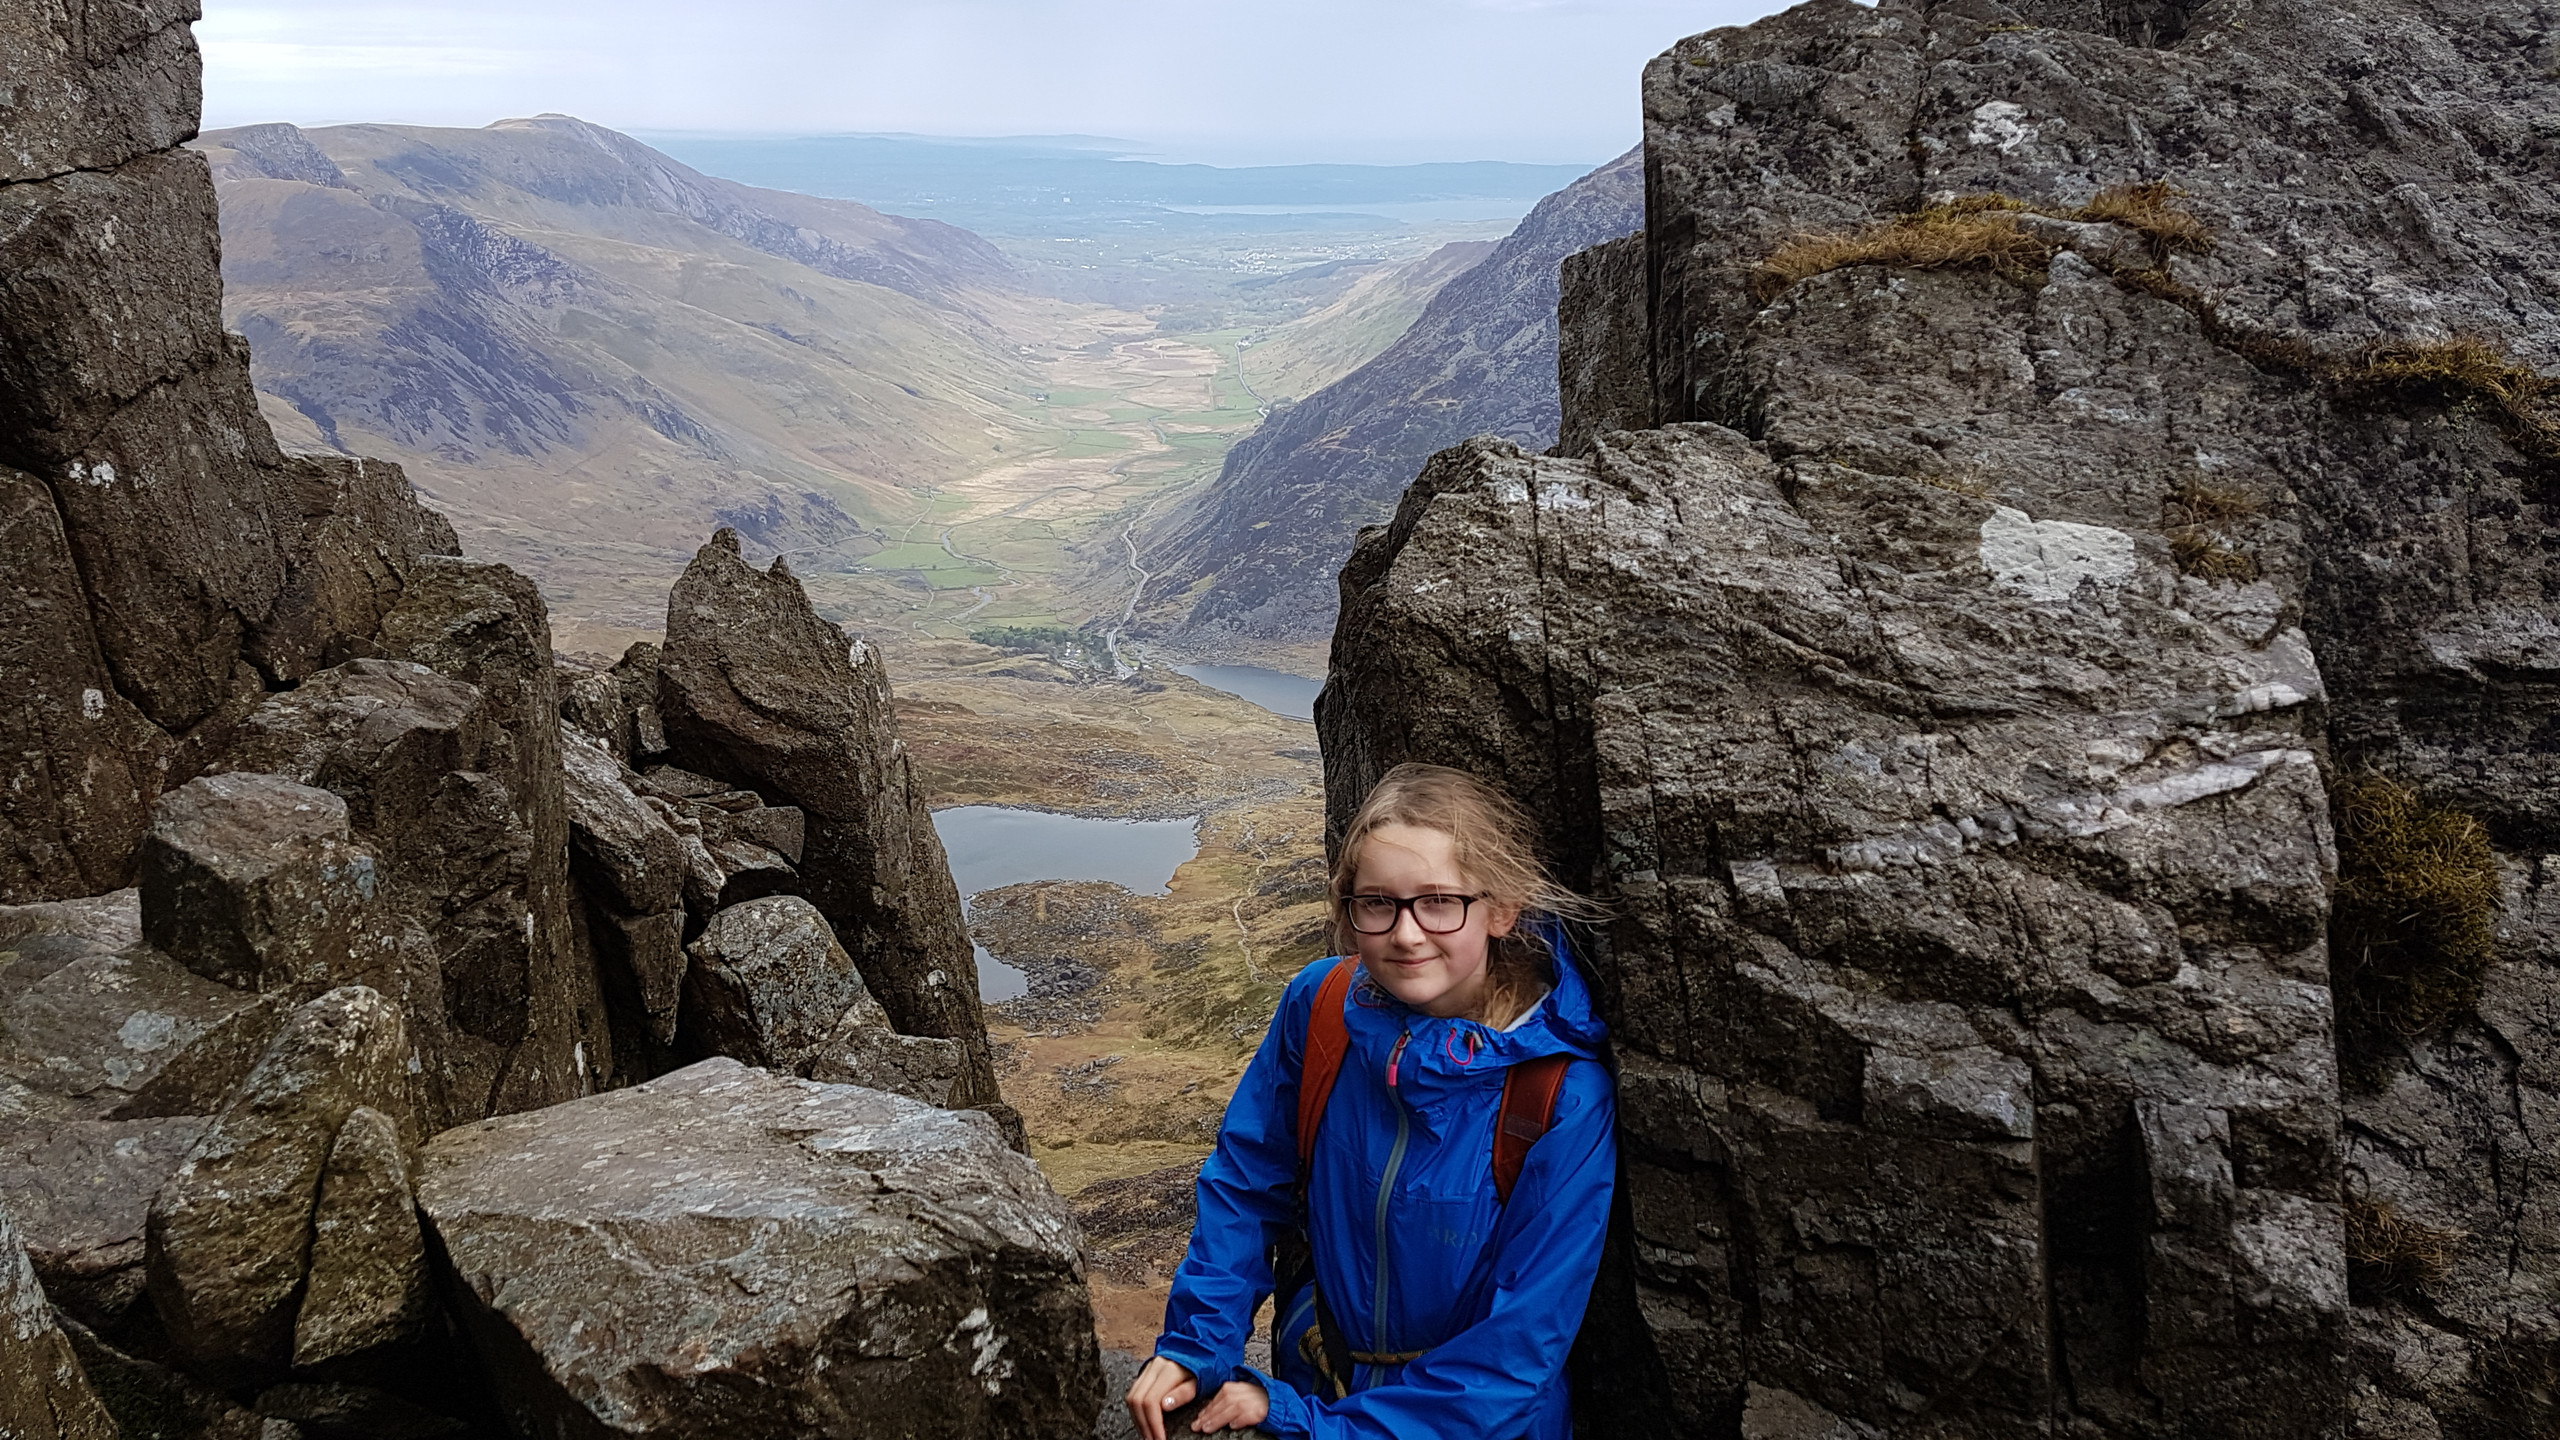 Near top of Bristly ridge